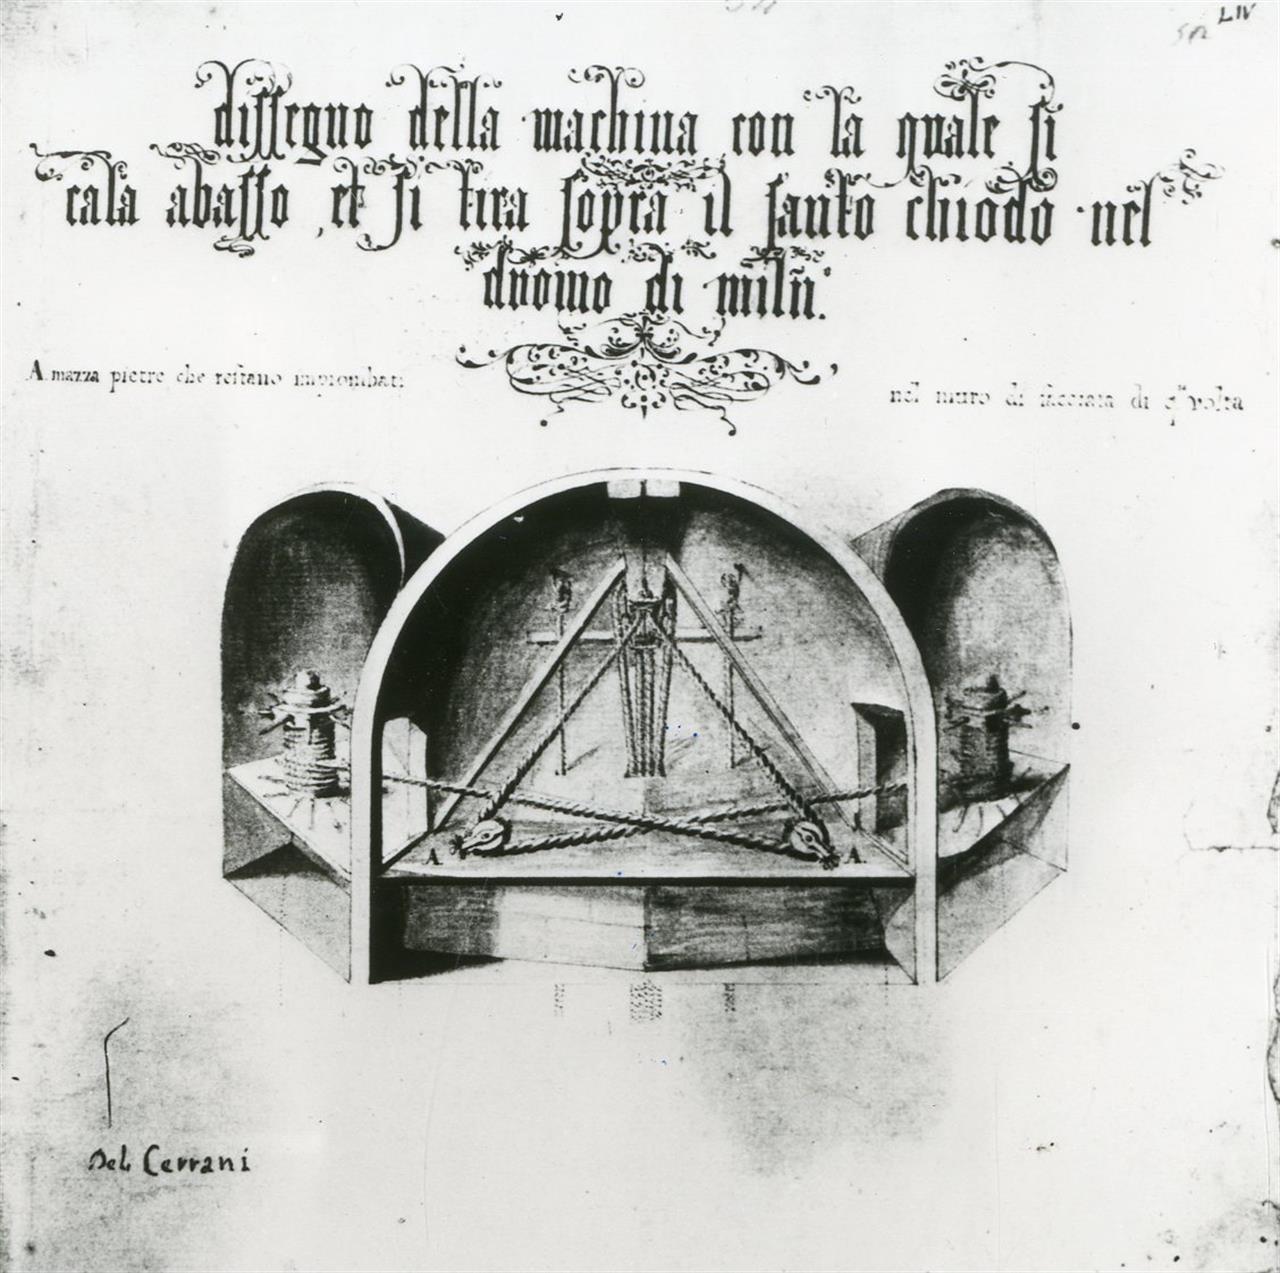 Argano Nivola - Archivio